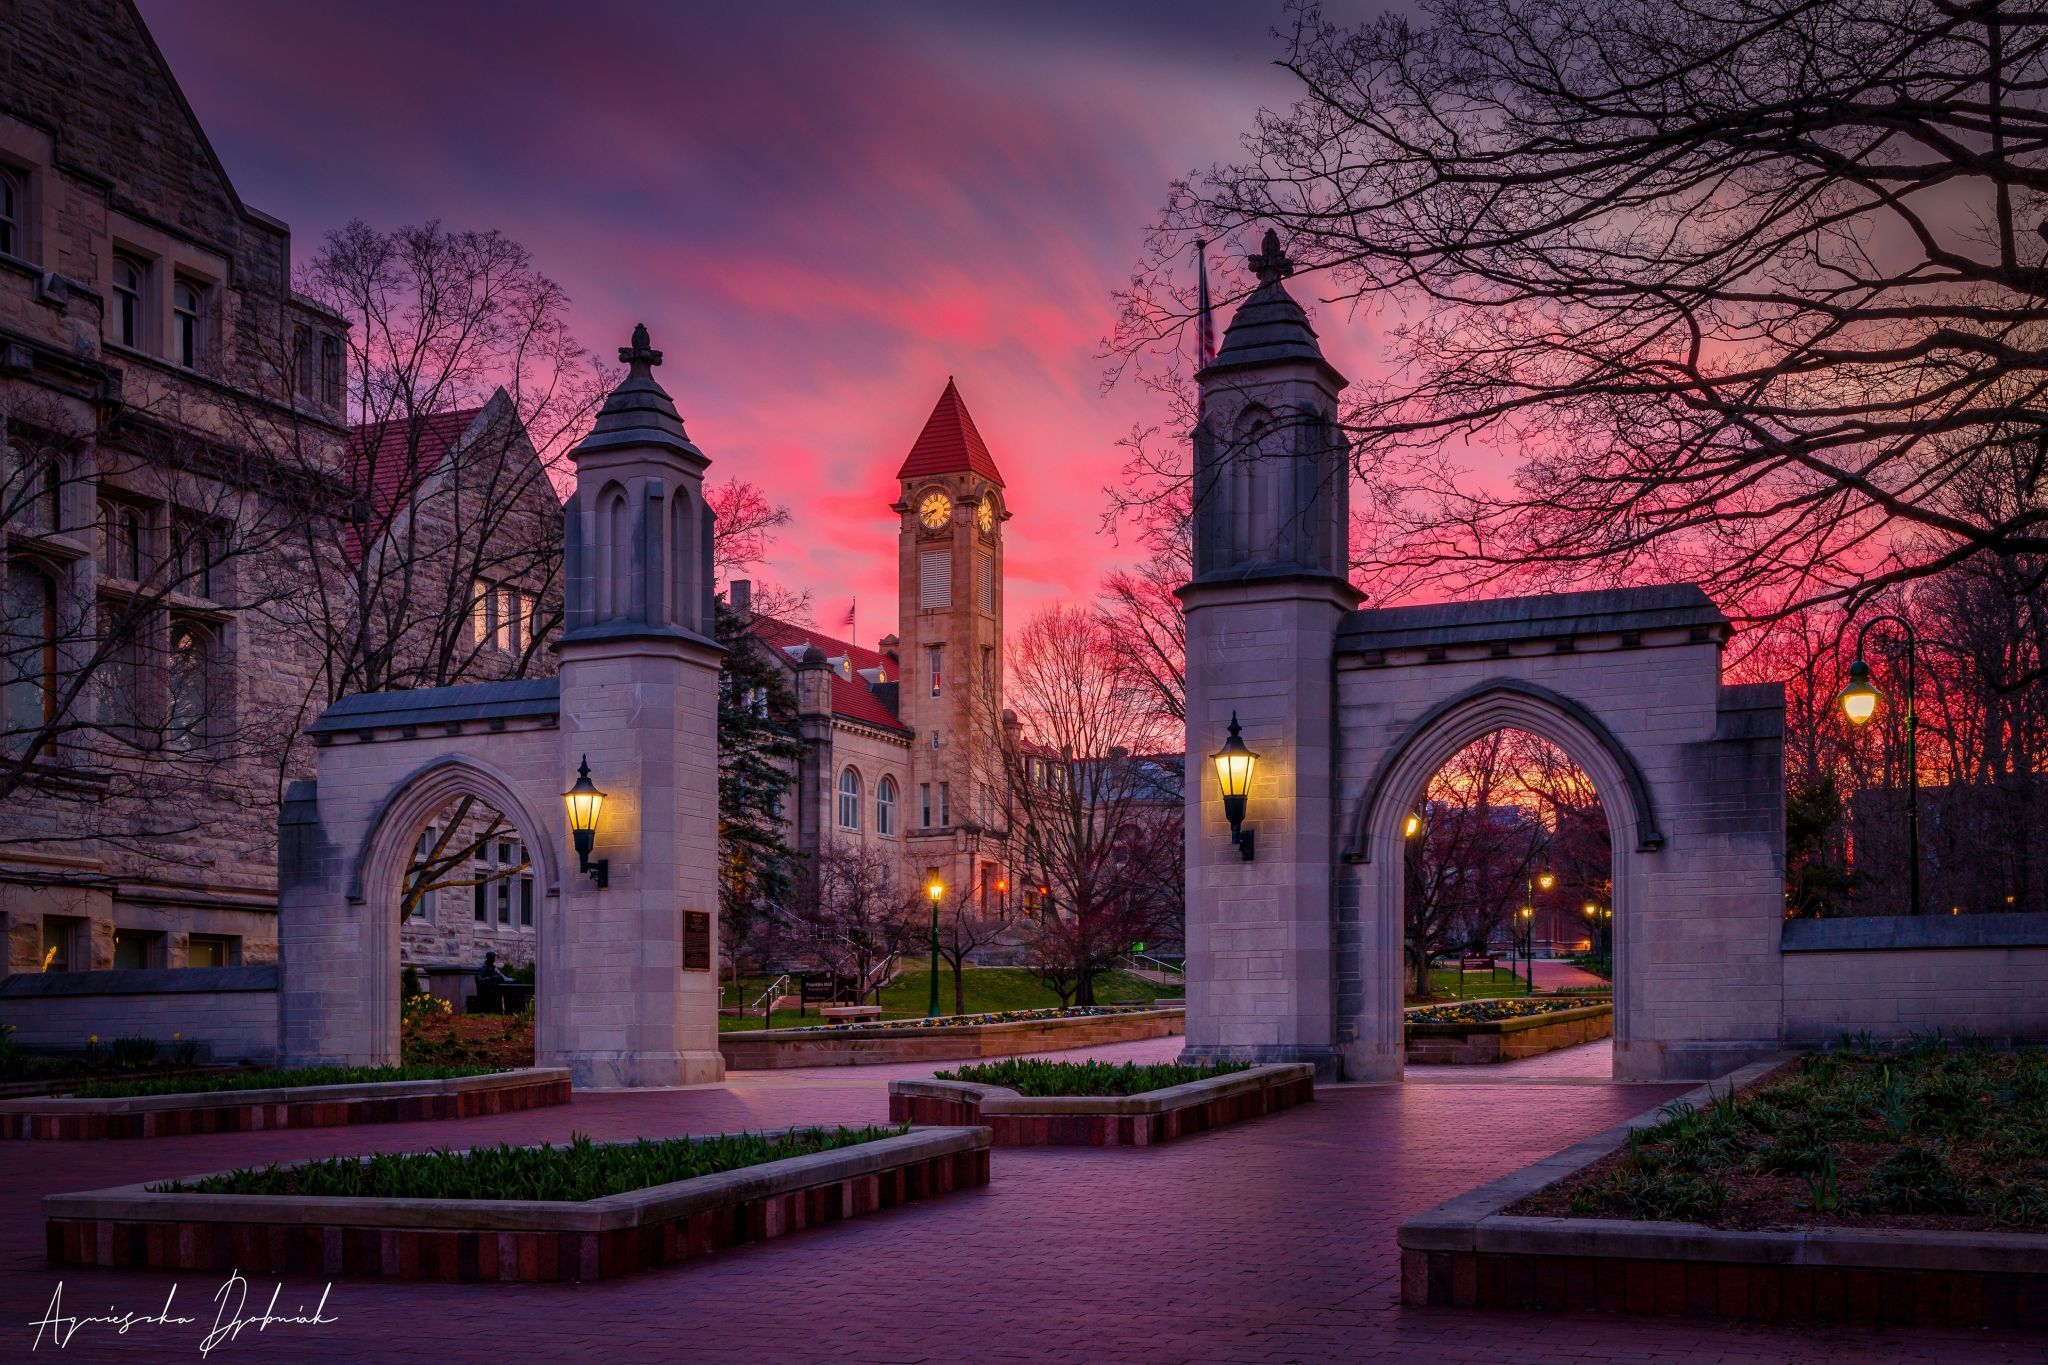 Sample Gates, Bloomington, IN USA, USA